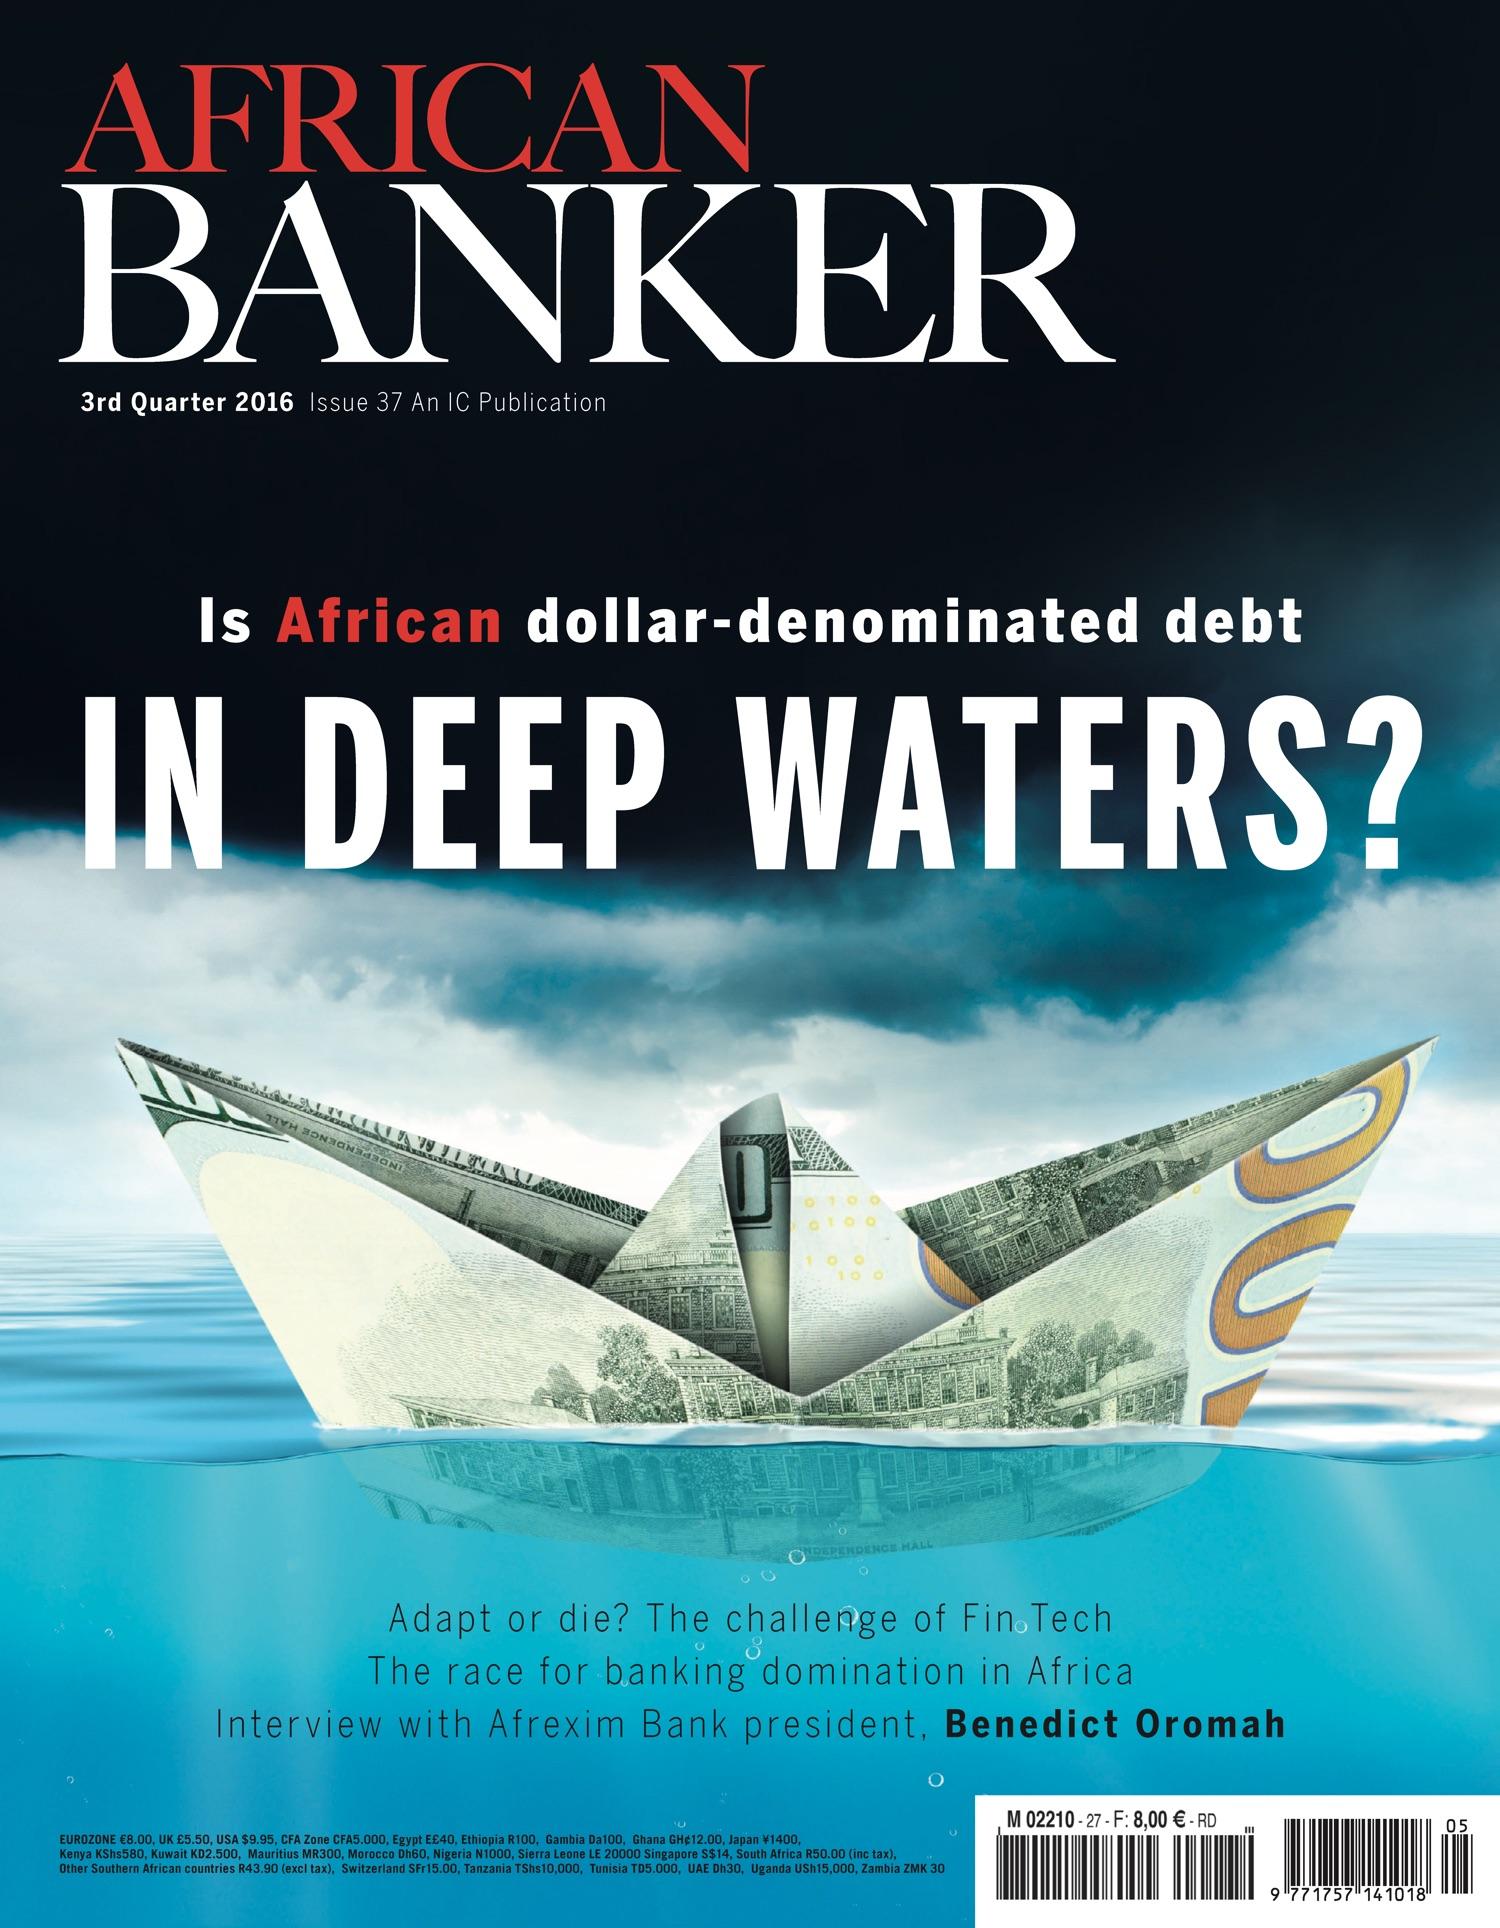 African Banker Magazine